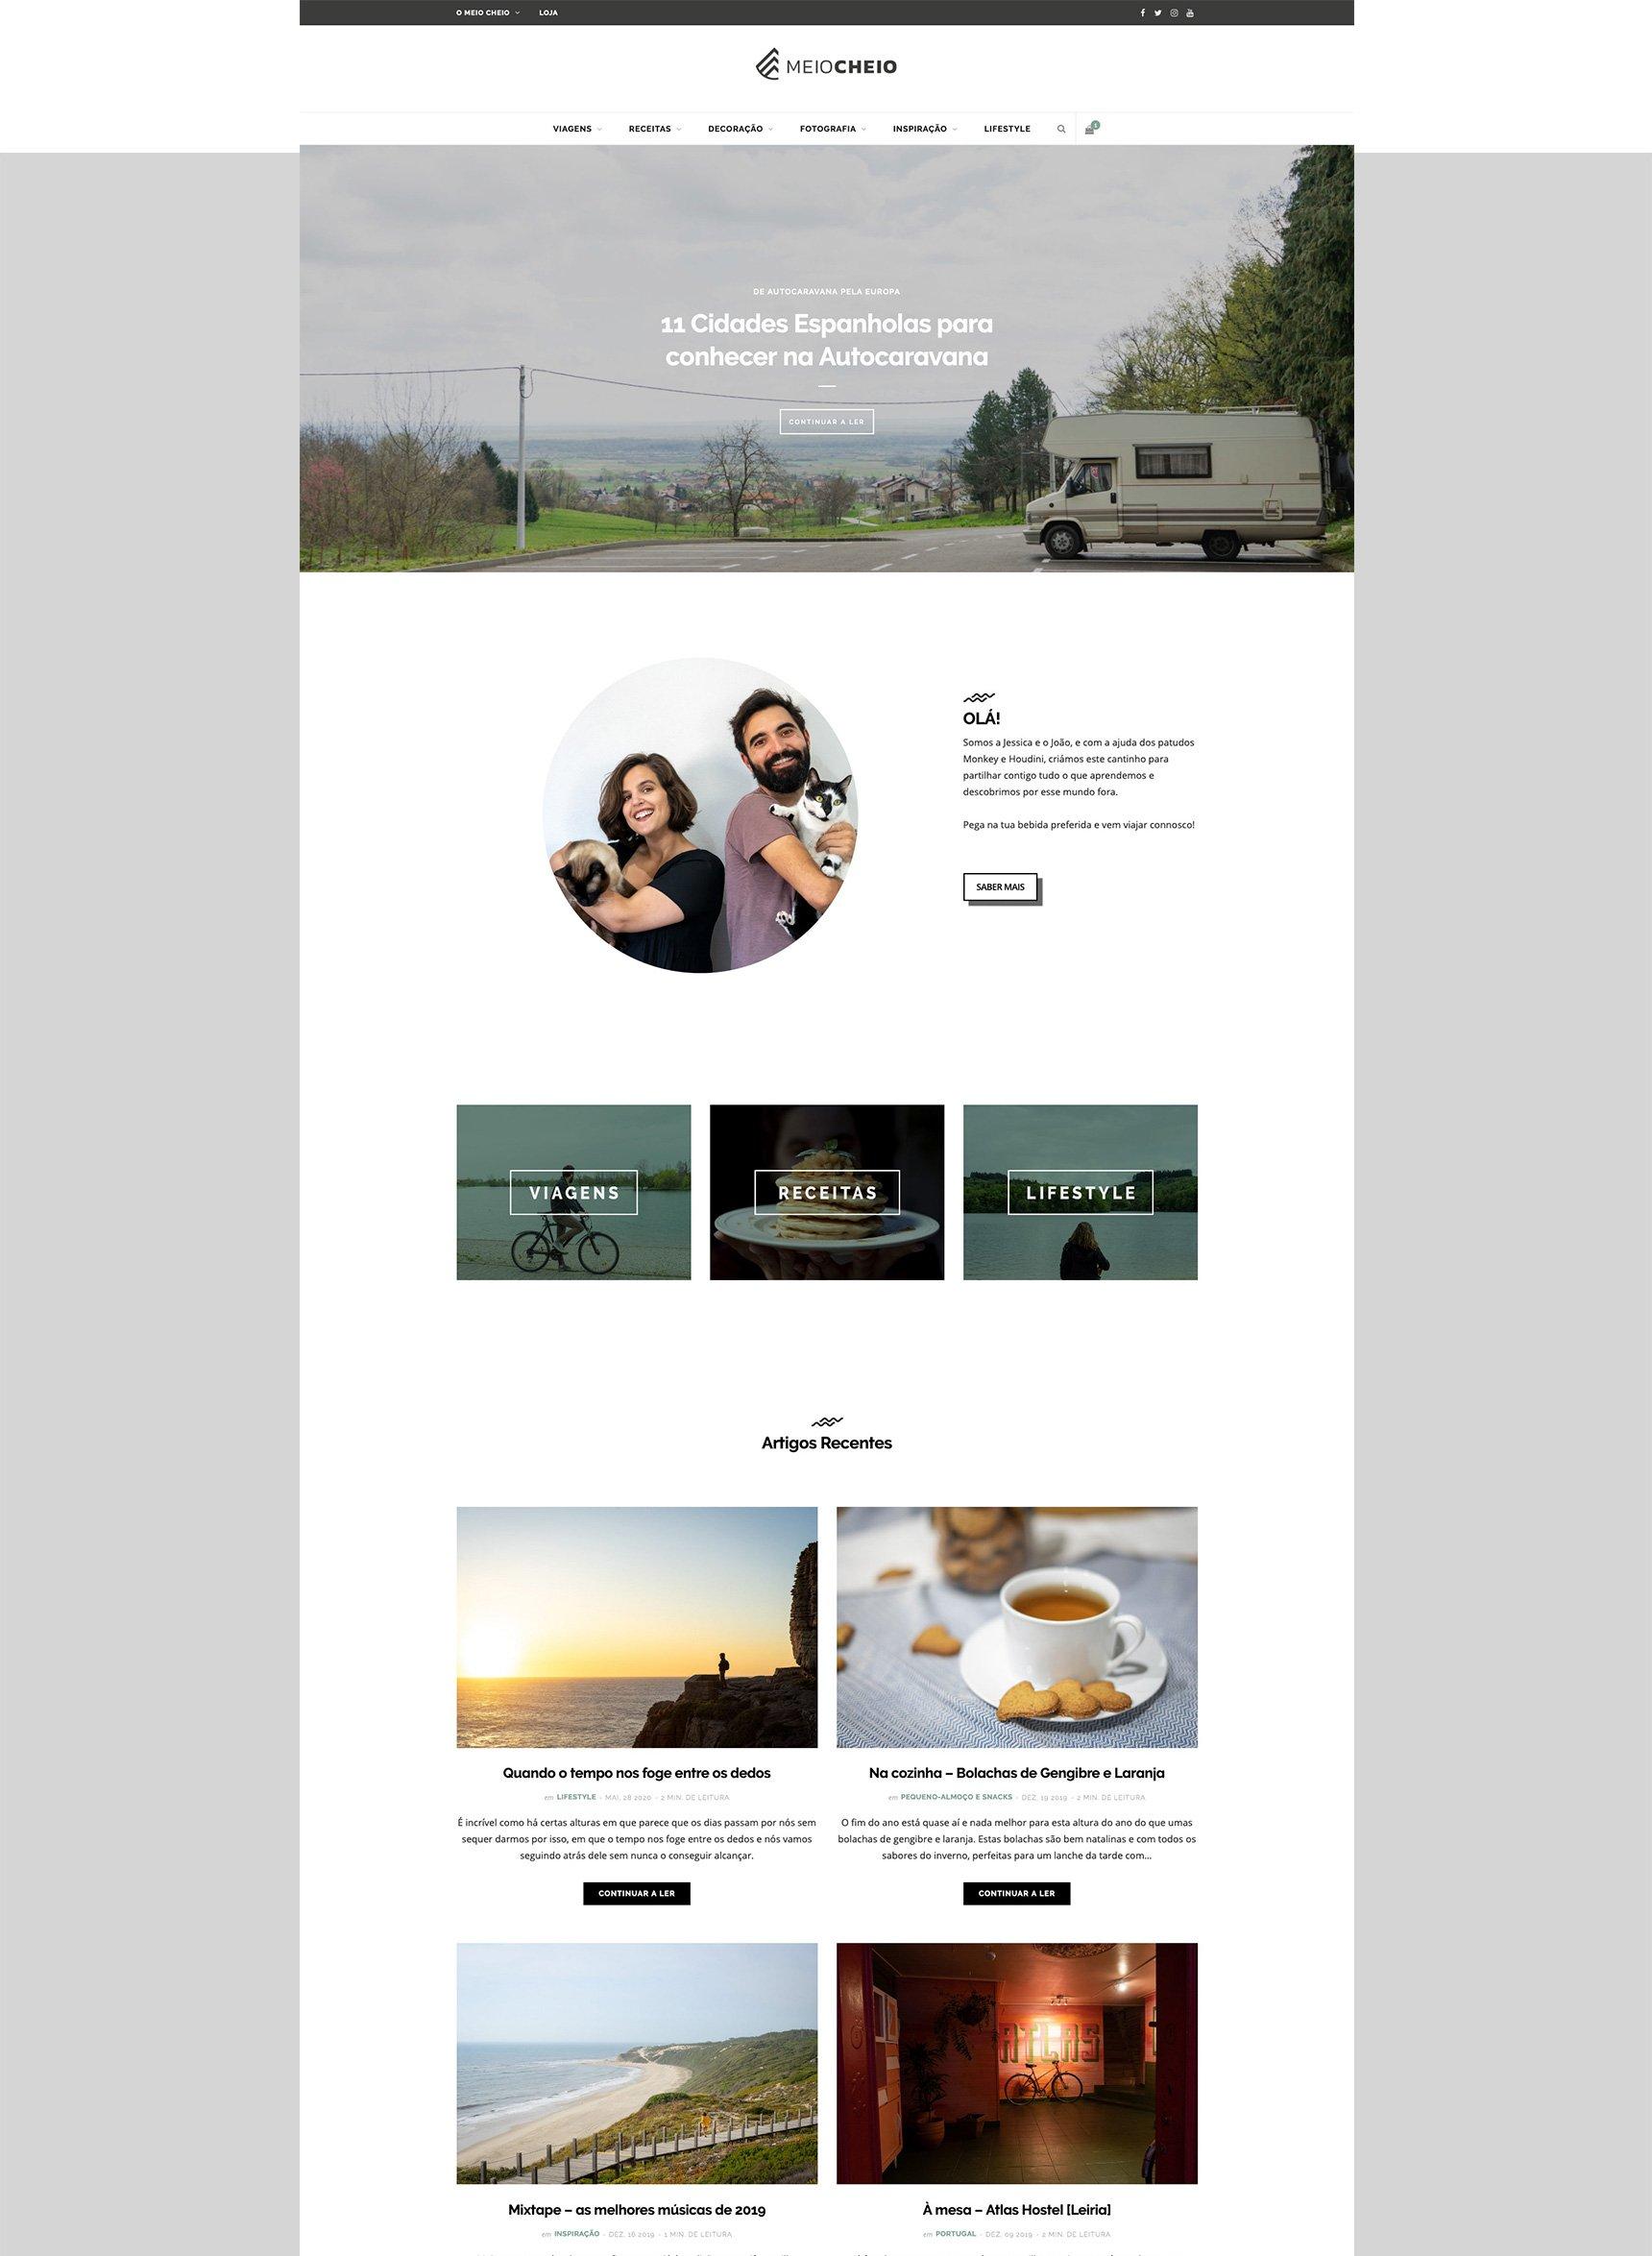 Homepage - Site de Viagens - Loja Online | Ecommerce | Meio Cheio